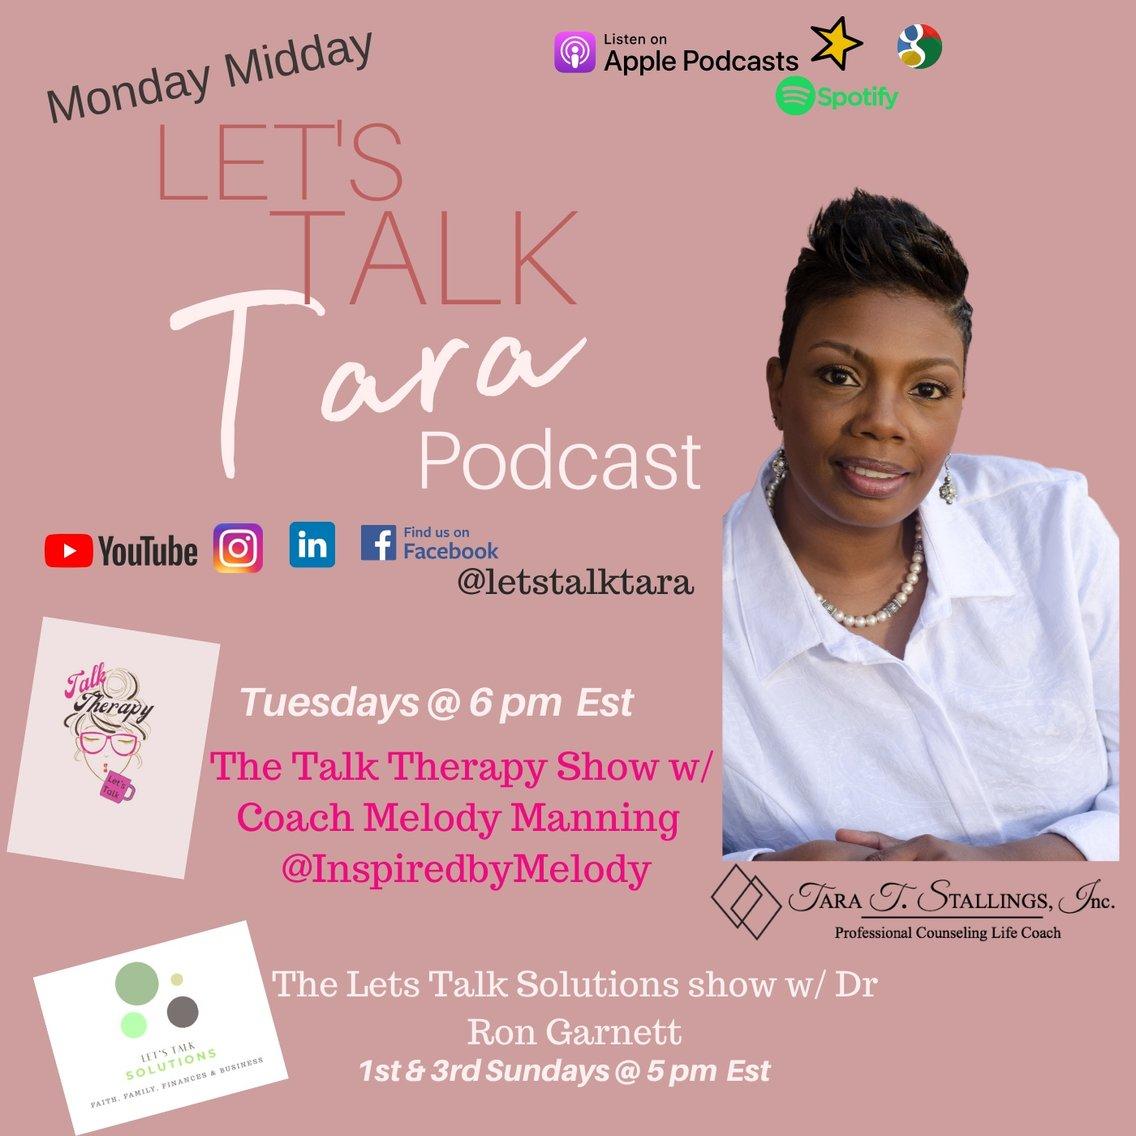 Let's Talk Tara Show - Cover Image